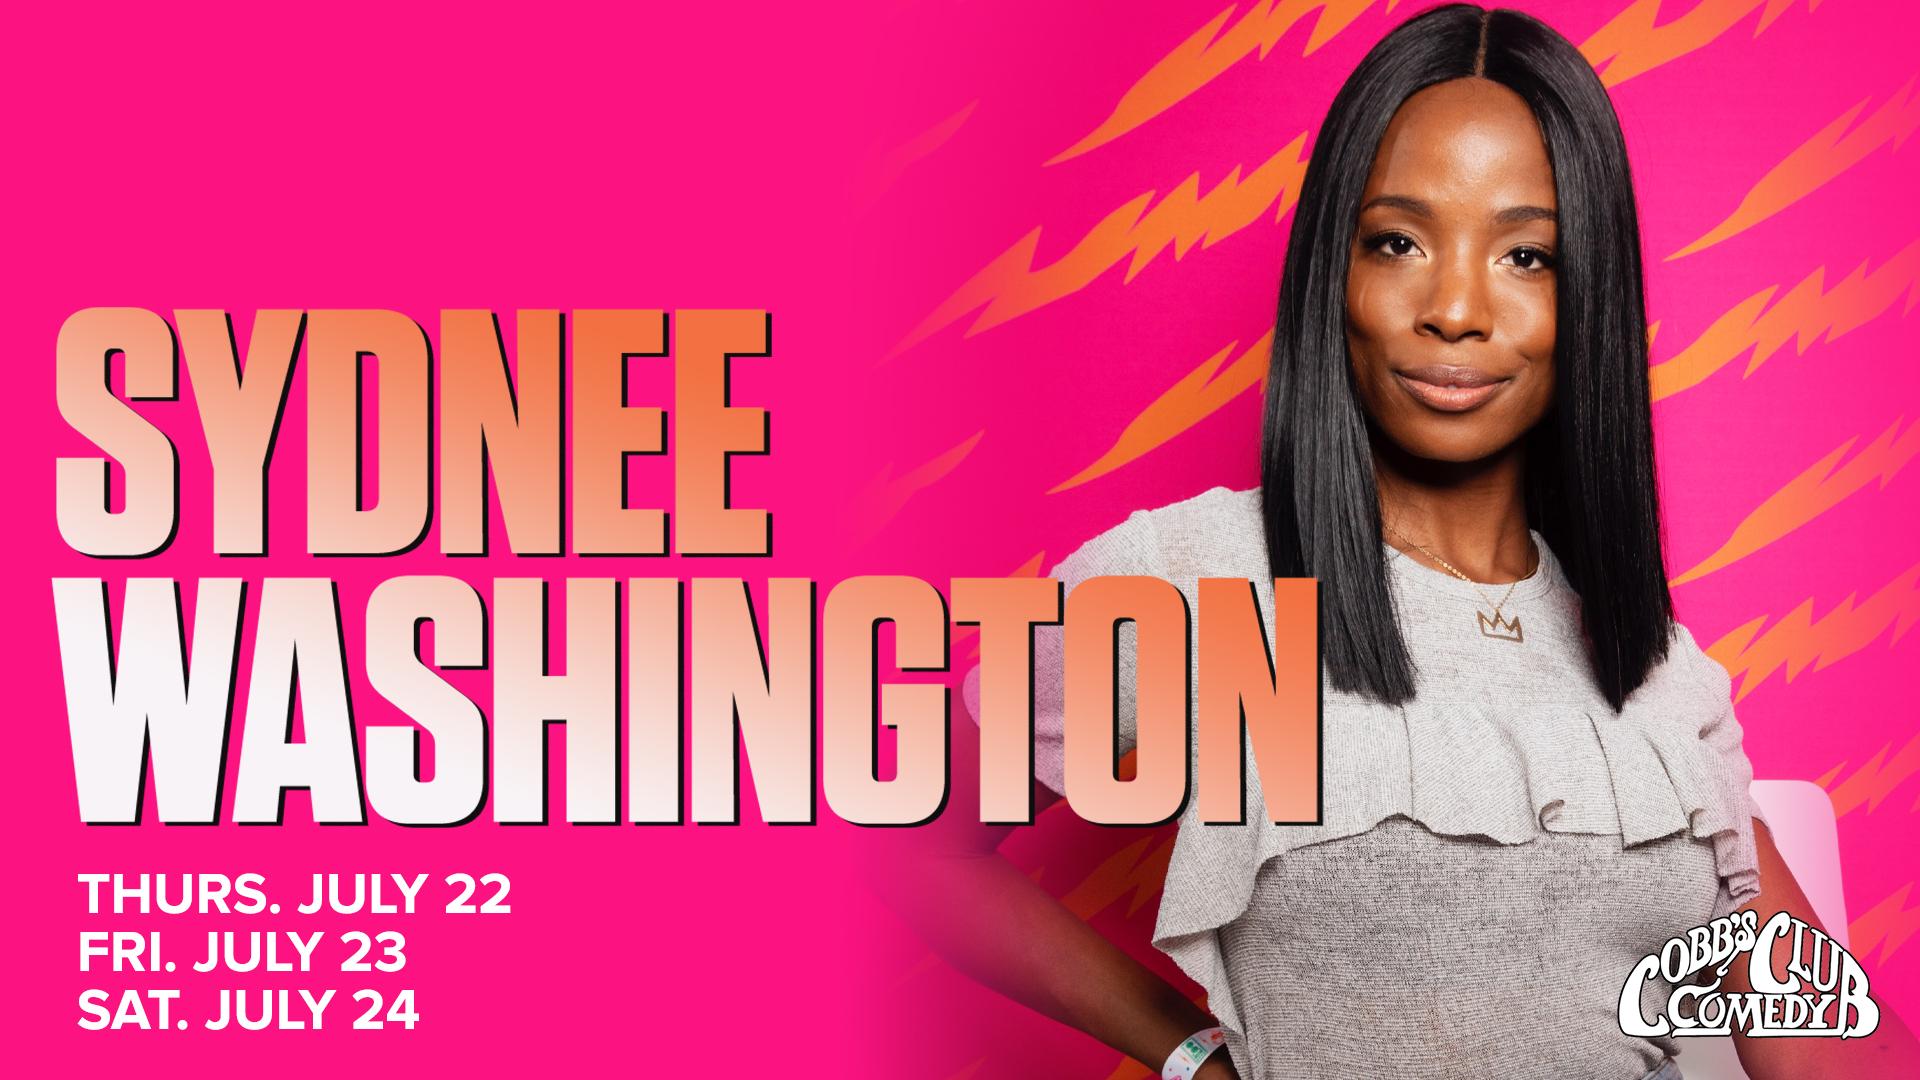 Sydnee Washington